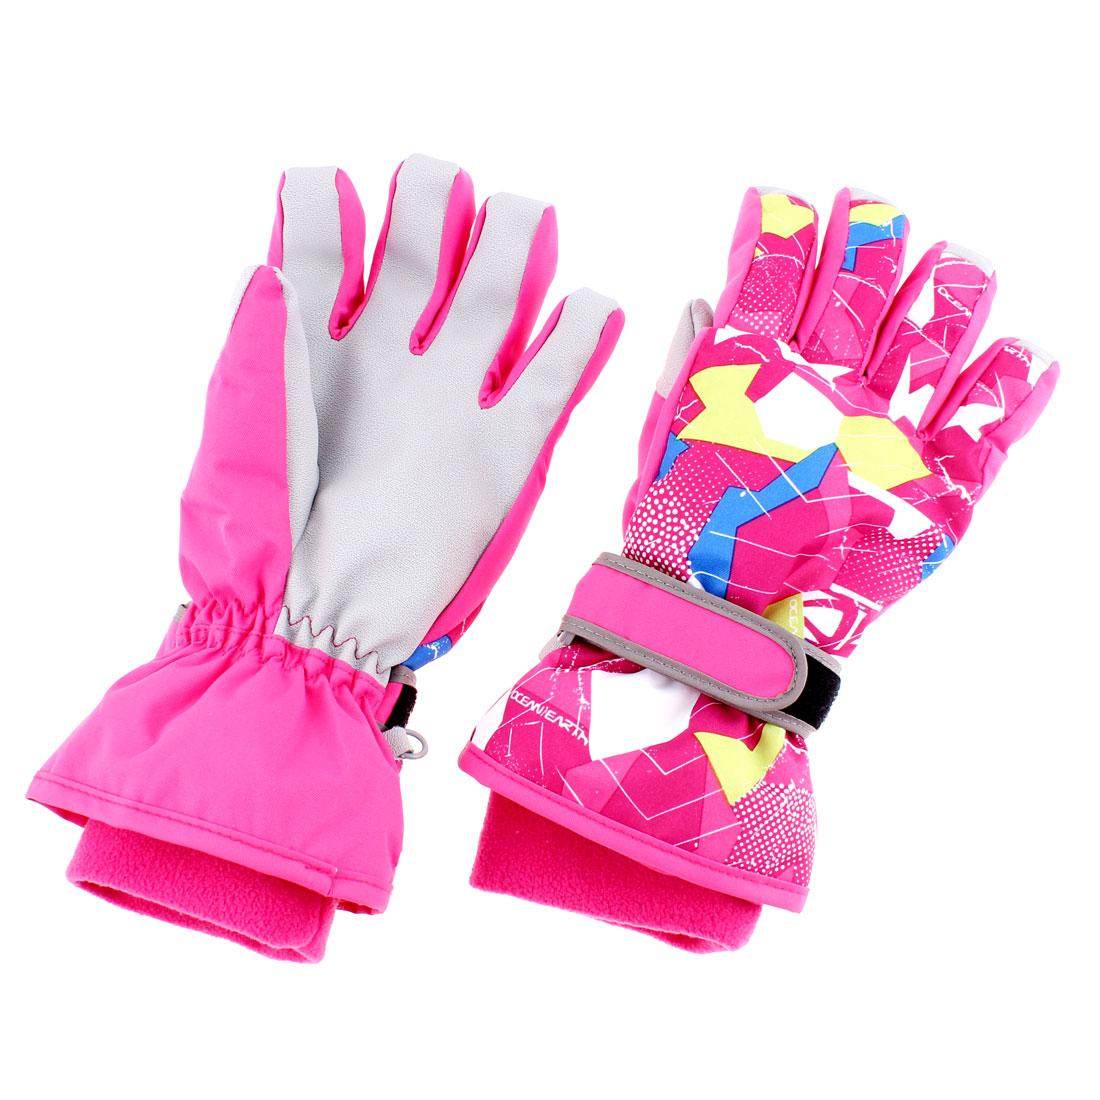 Kids Winter Outdoor Sports Ski Snowboard Gloves Fuchsia XS Pair